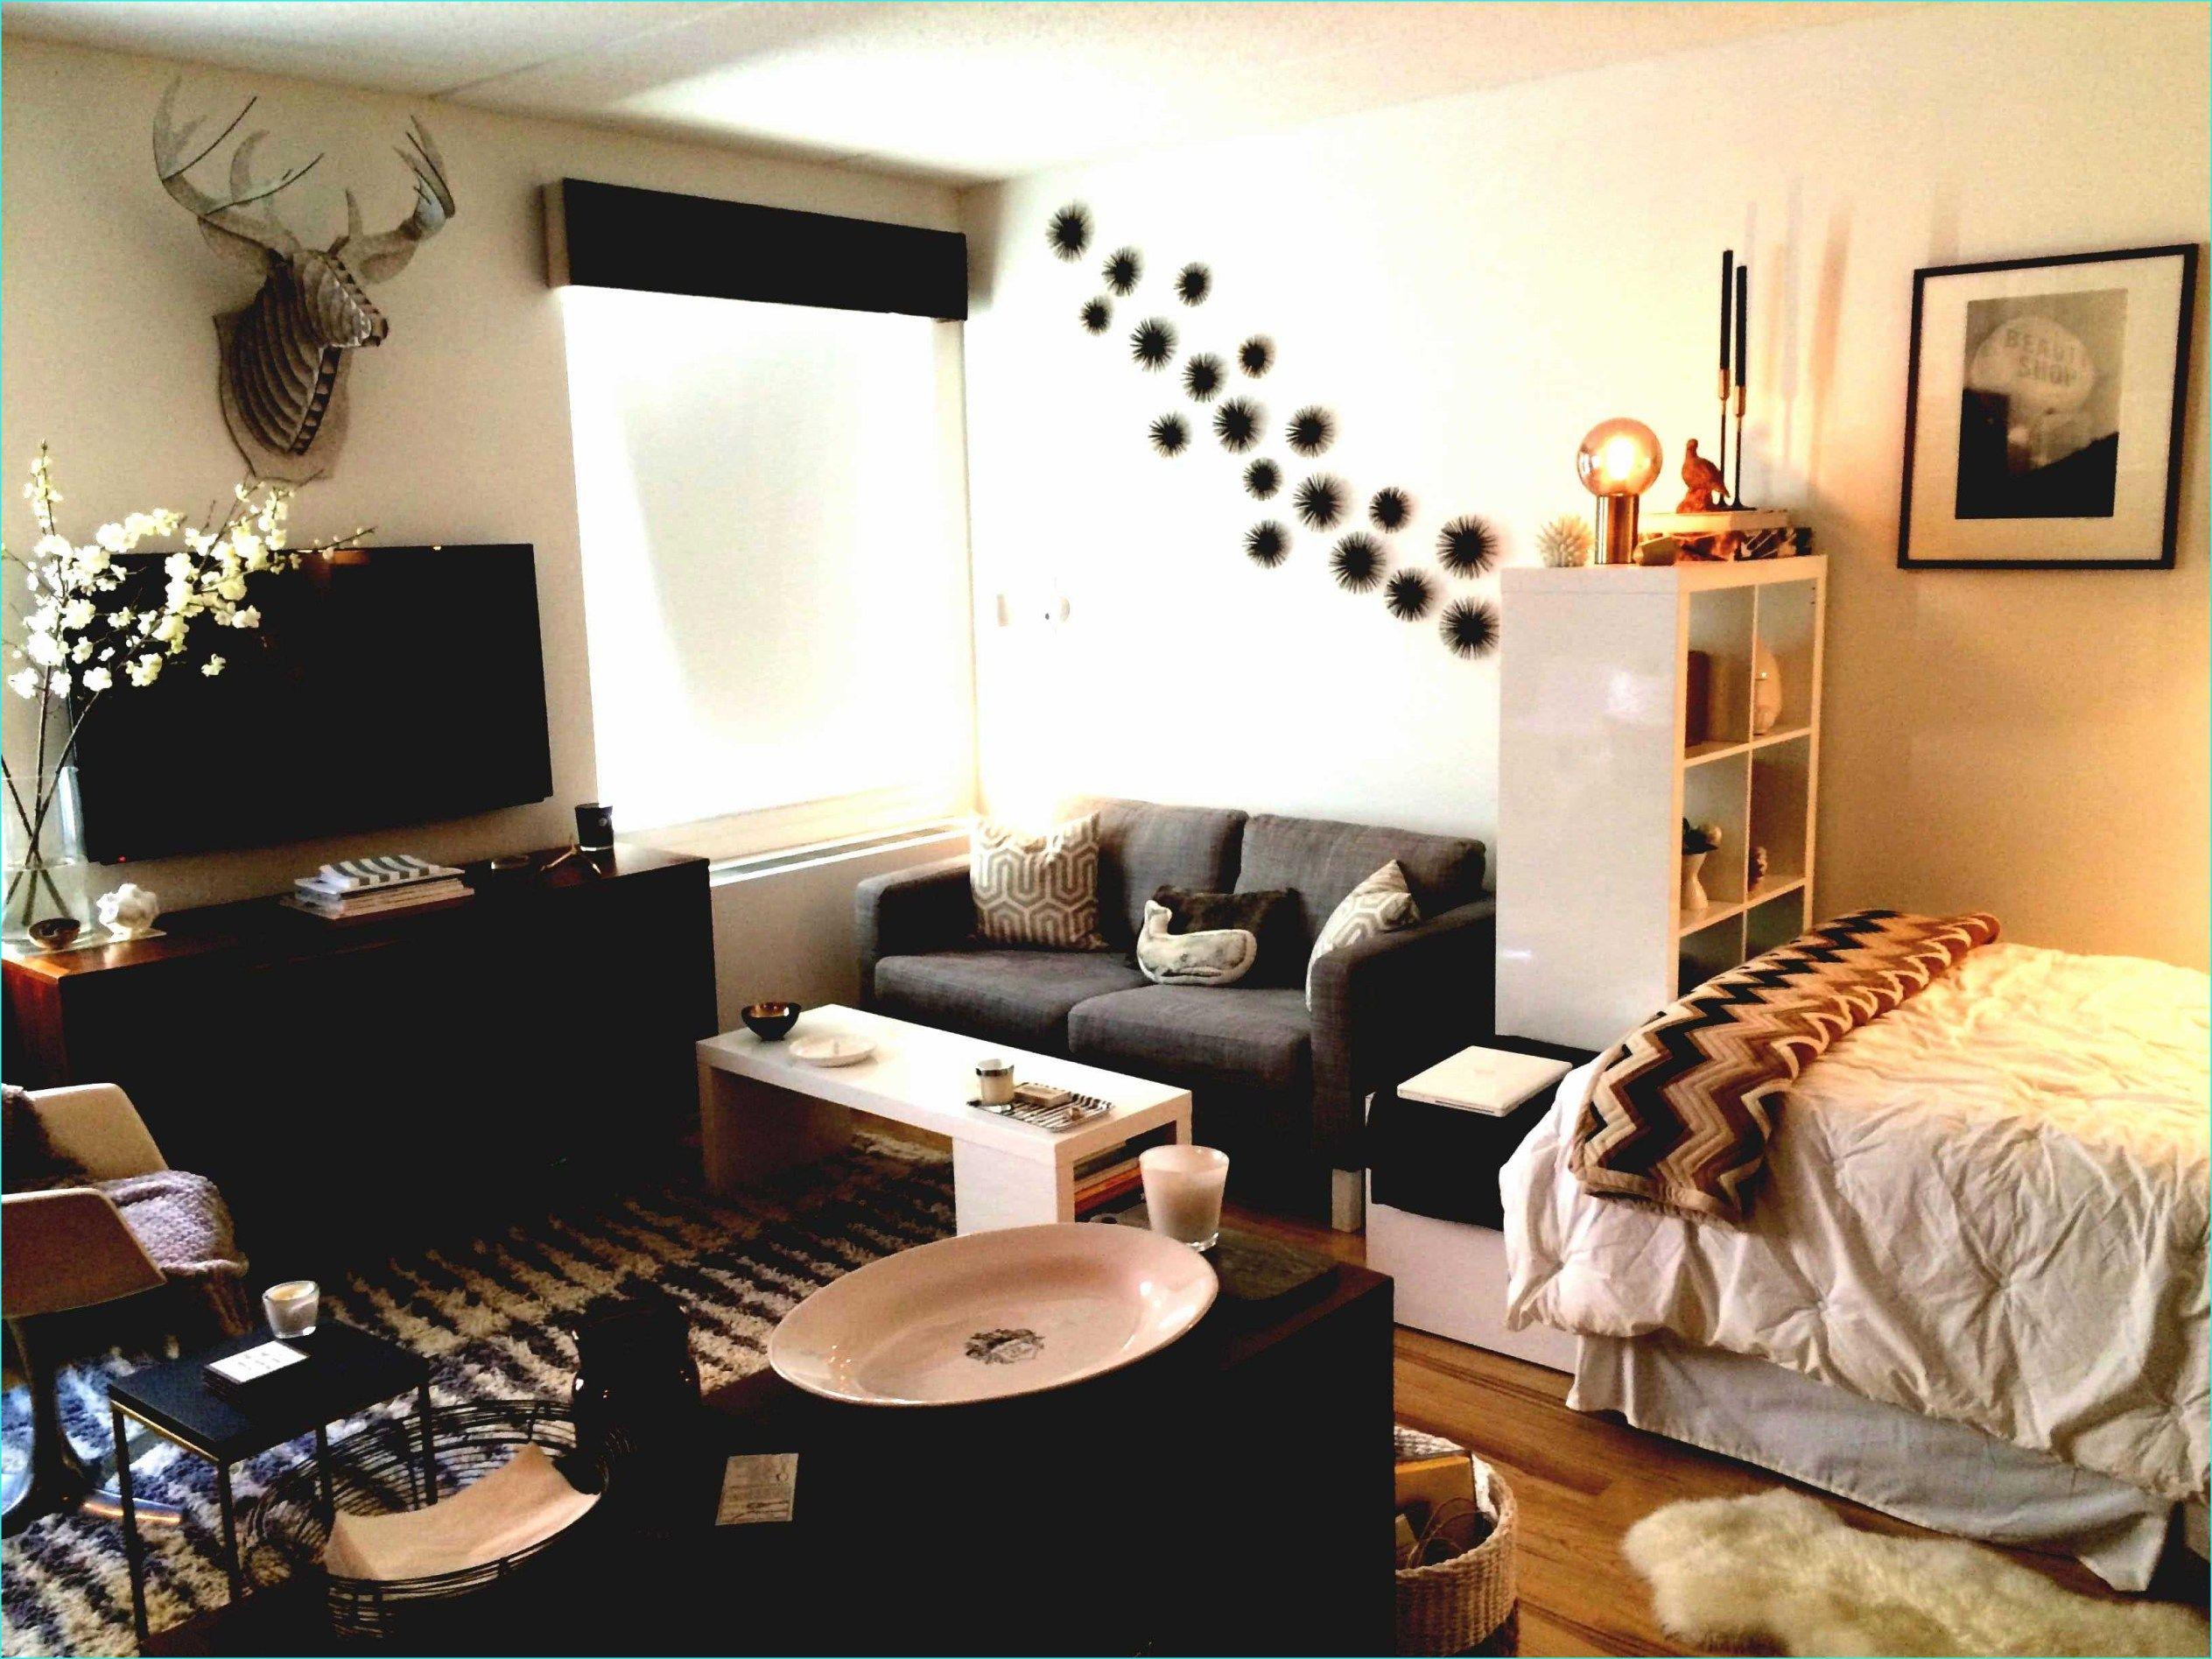 44 Cozy Extra Small Studio Apartment Ideas | Apartment ...